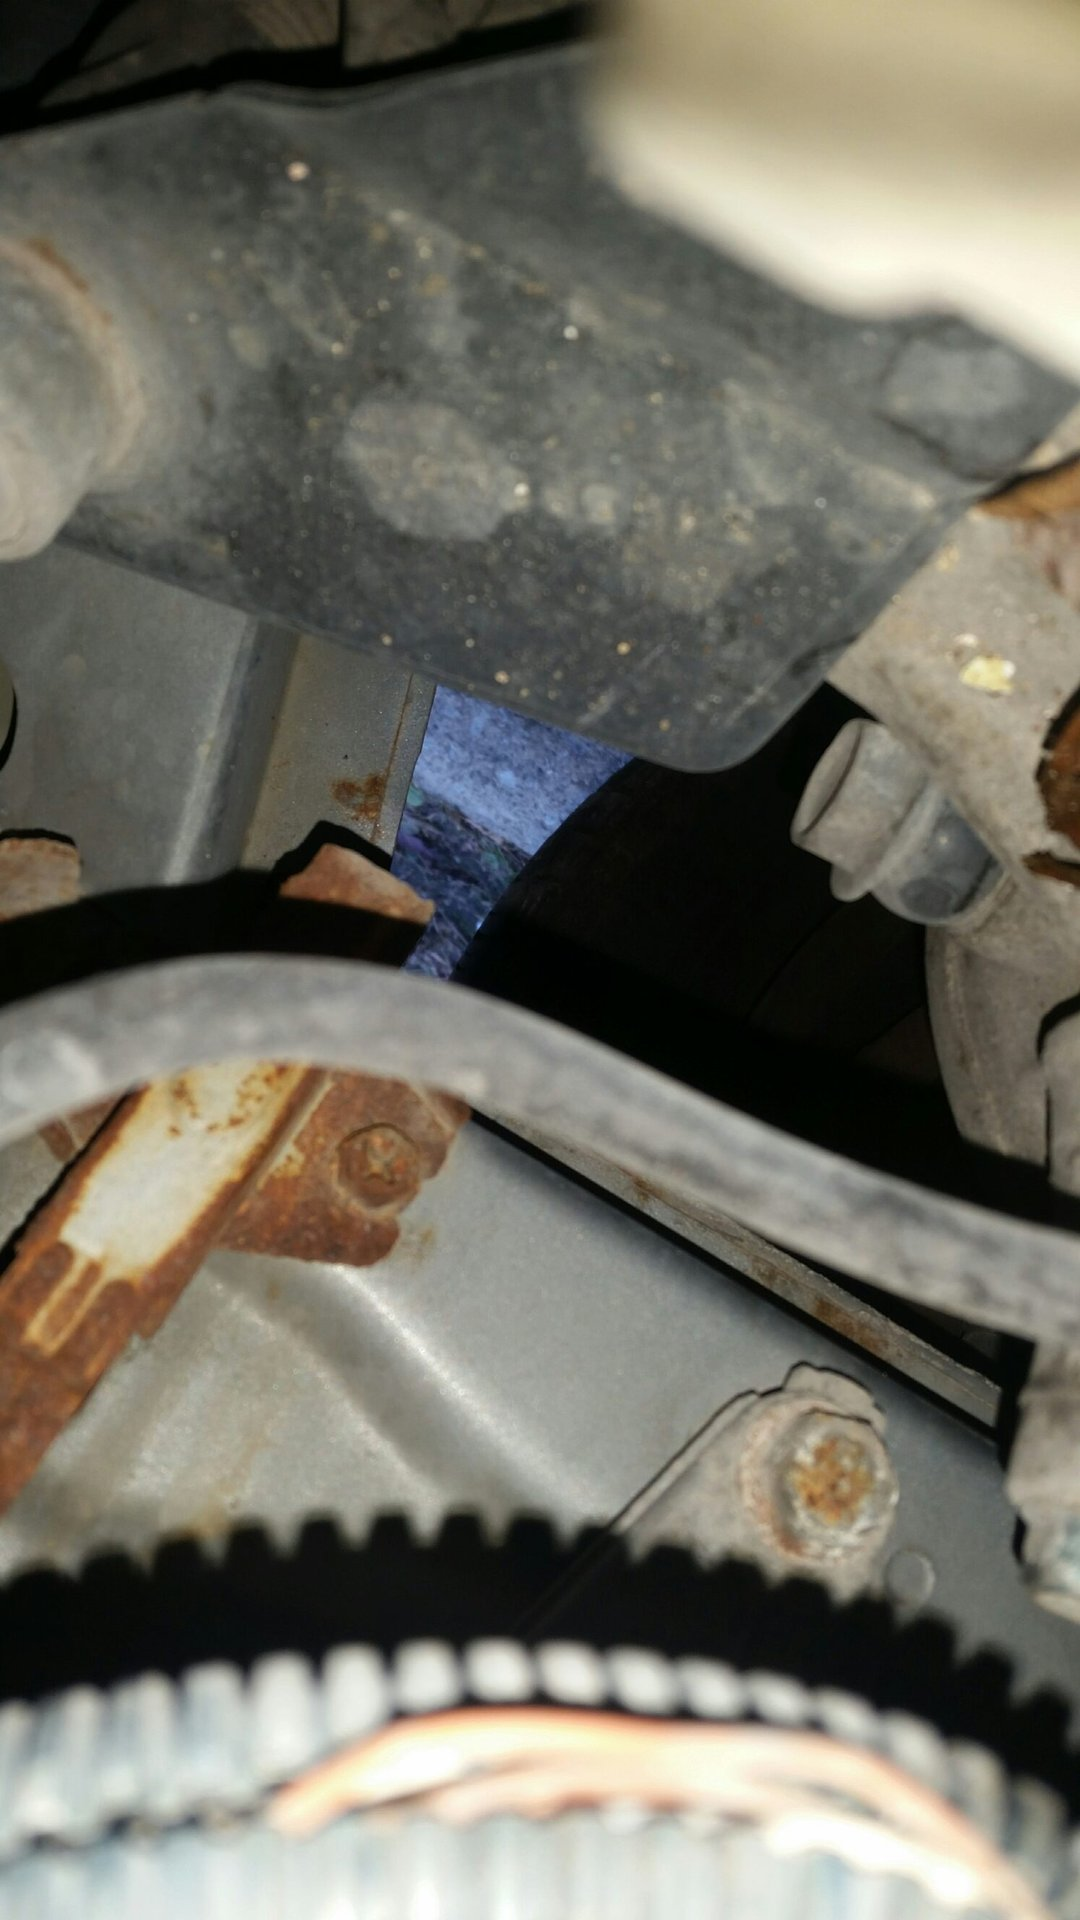 09 Versa P0745 - Dealership Shop Failure | Nissan Forum